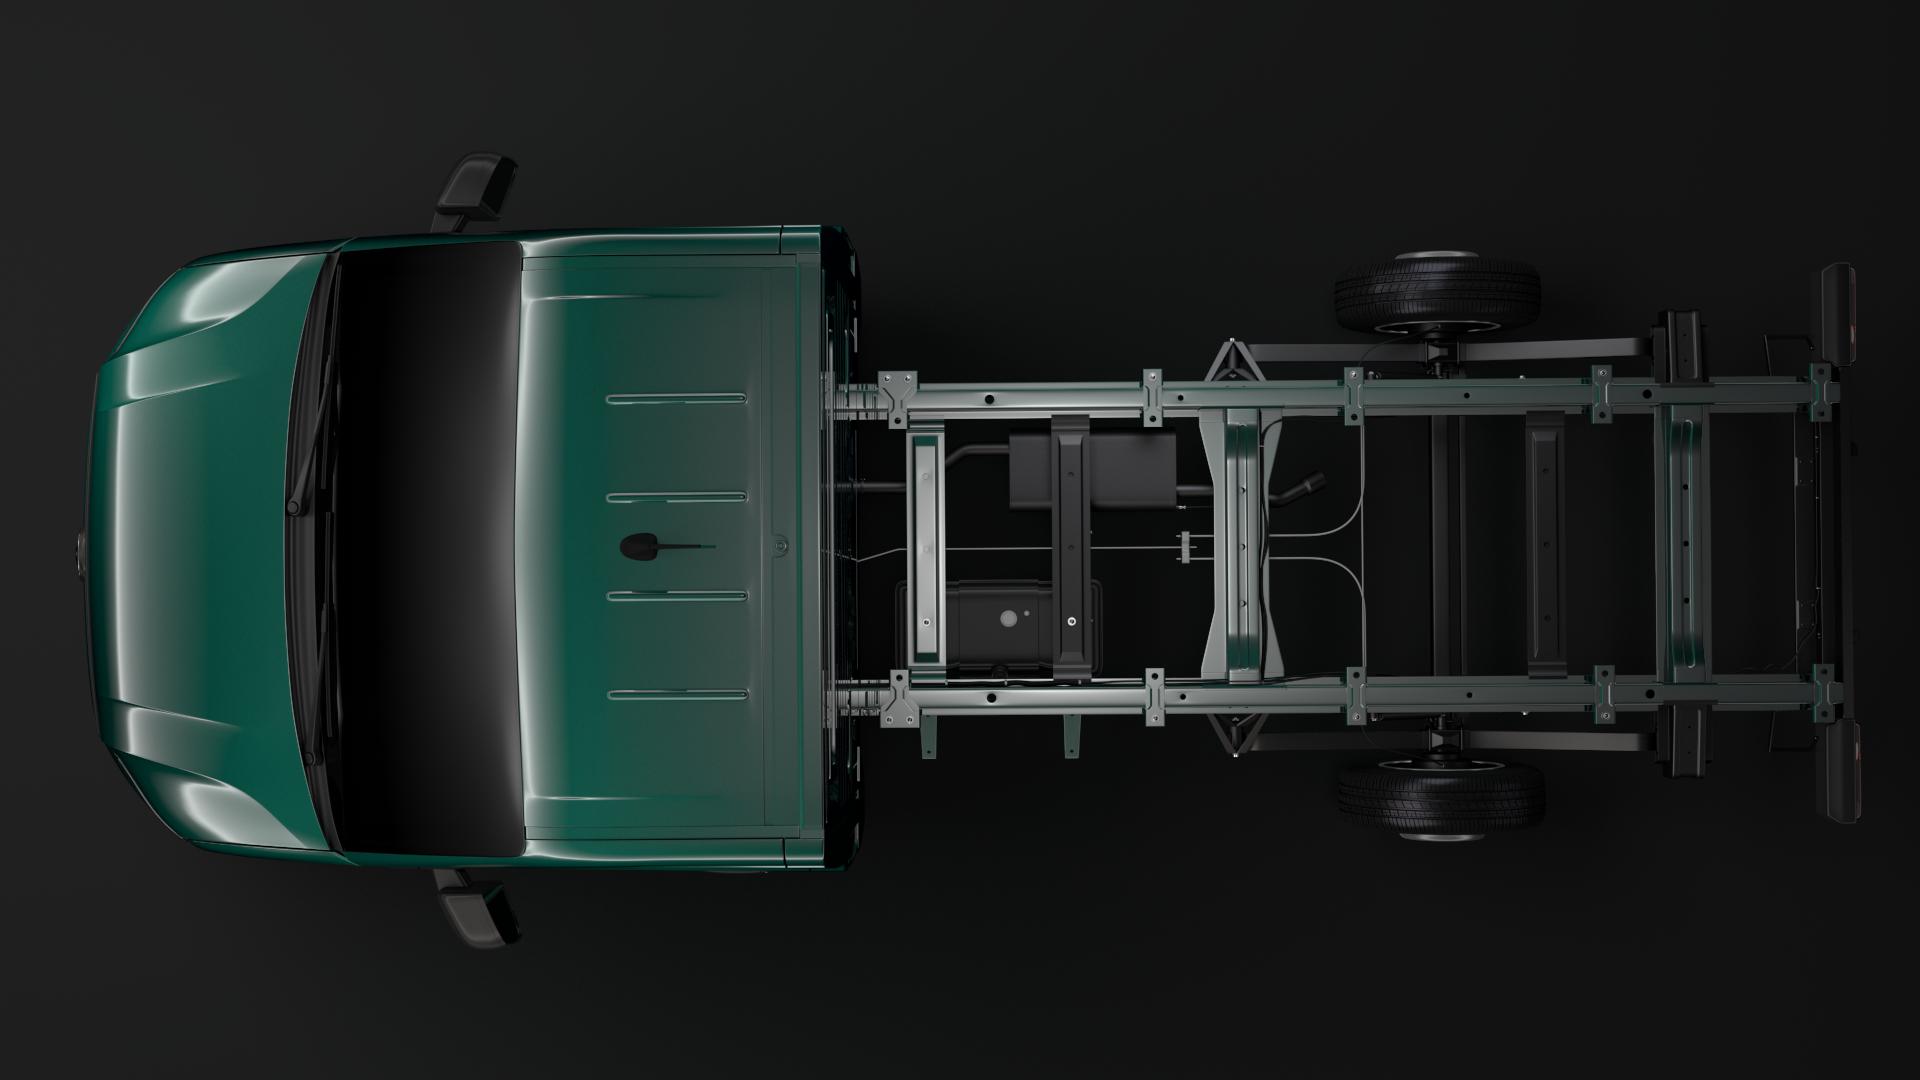 wv crafter chassis single-cab 2017 3d model max fbx c4d lwo ma mb hrc xsi obj 275100